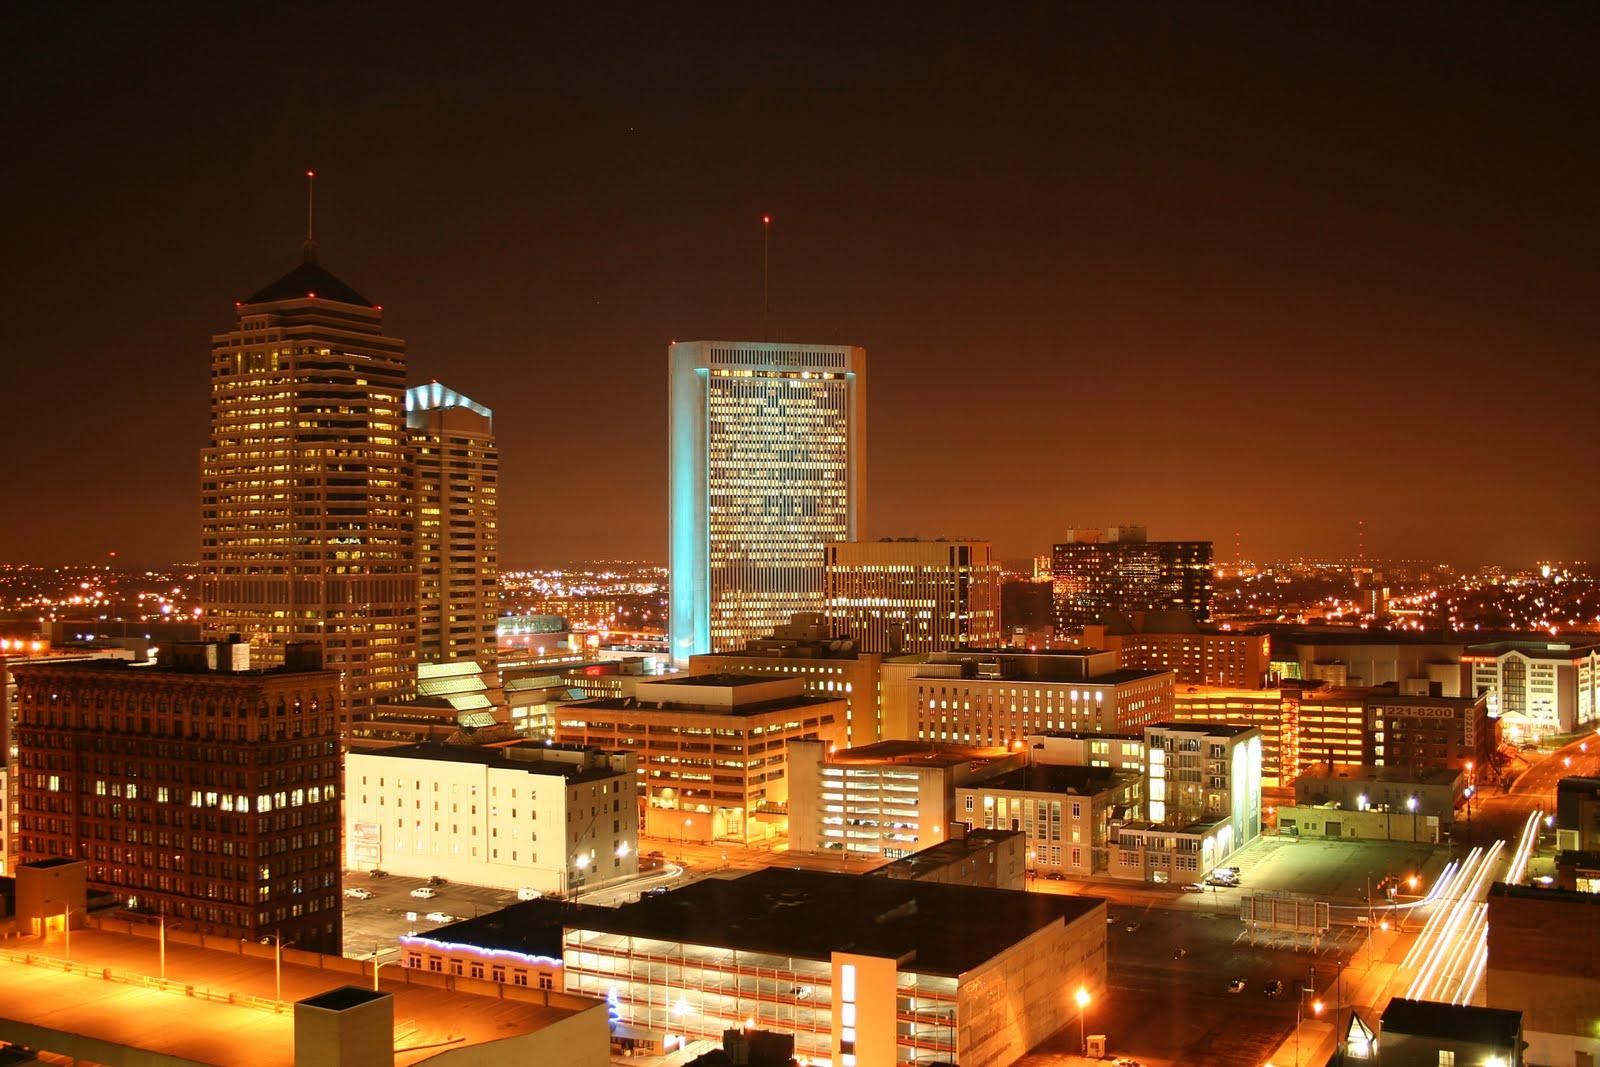 City skyline of Columbus Ohio